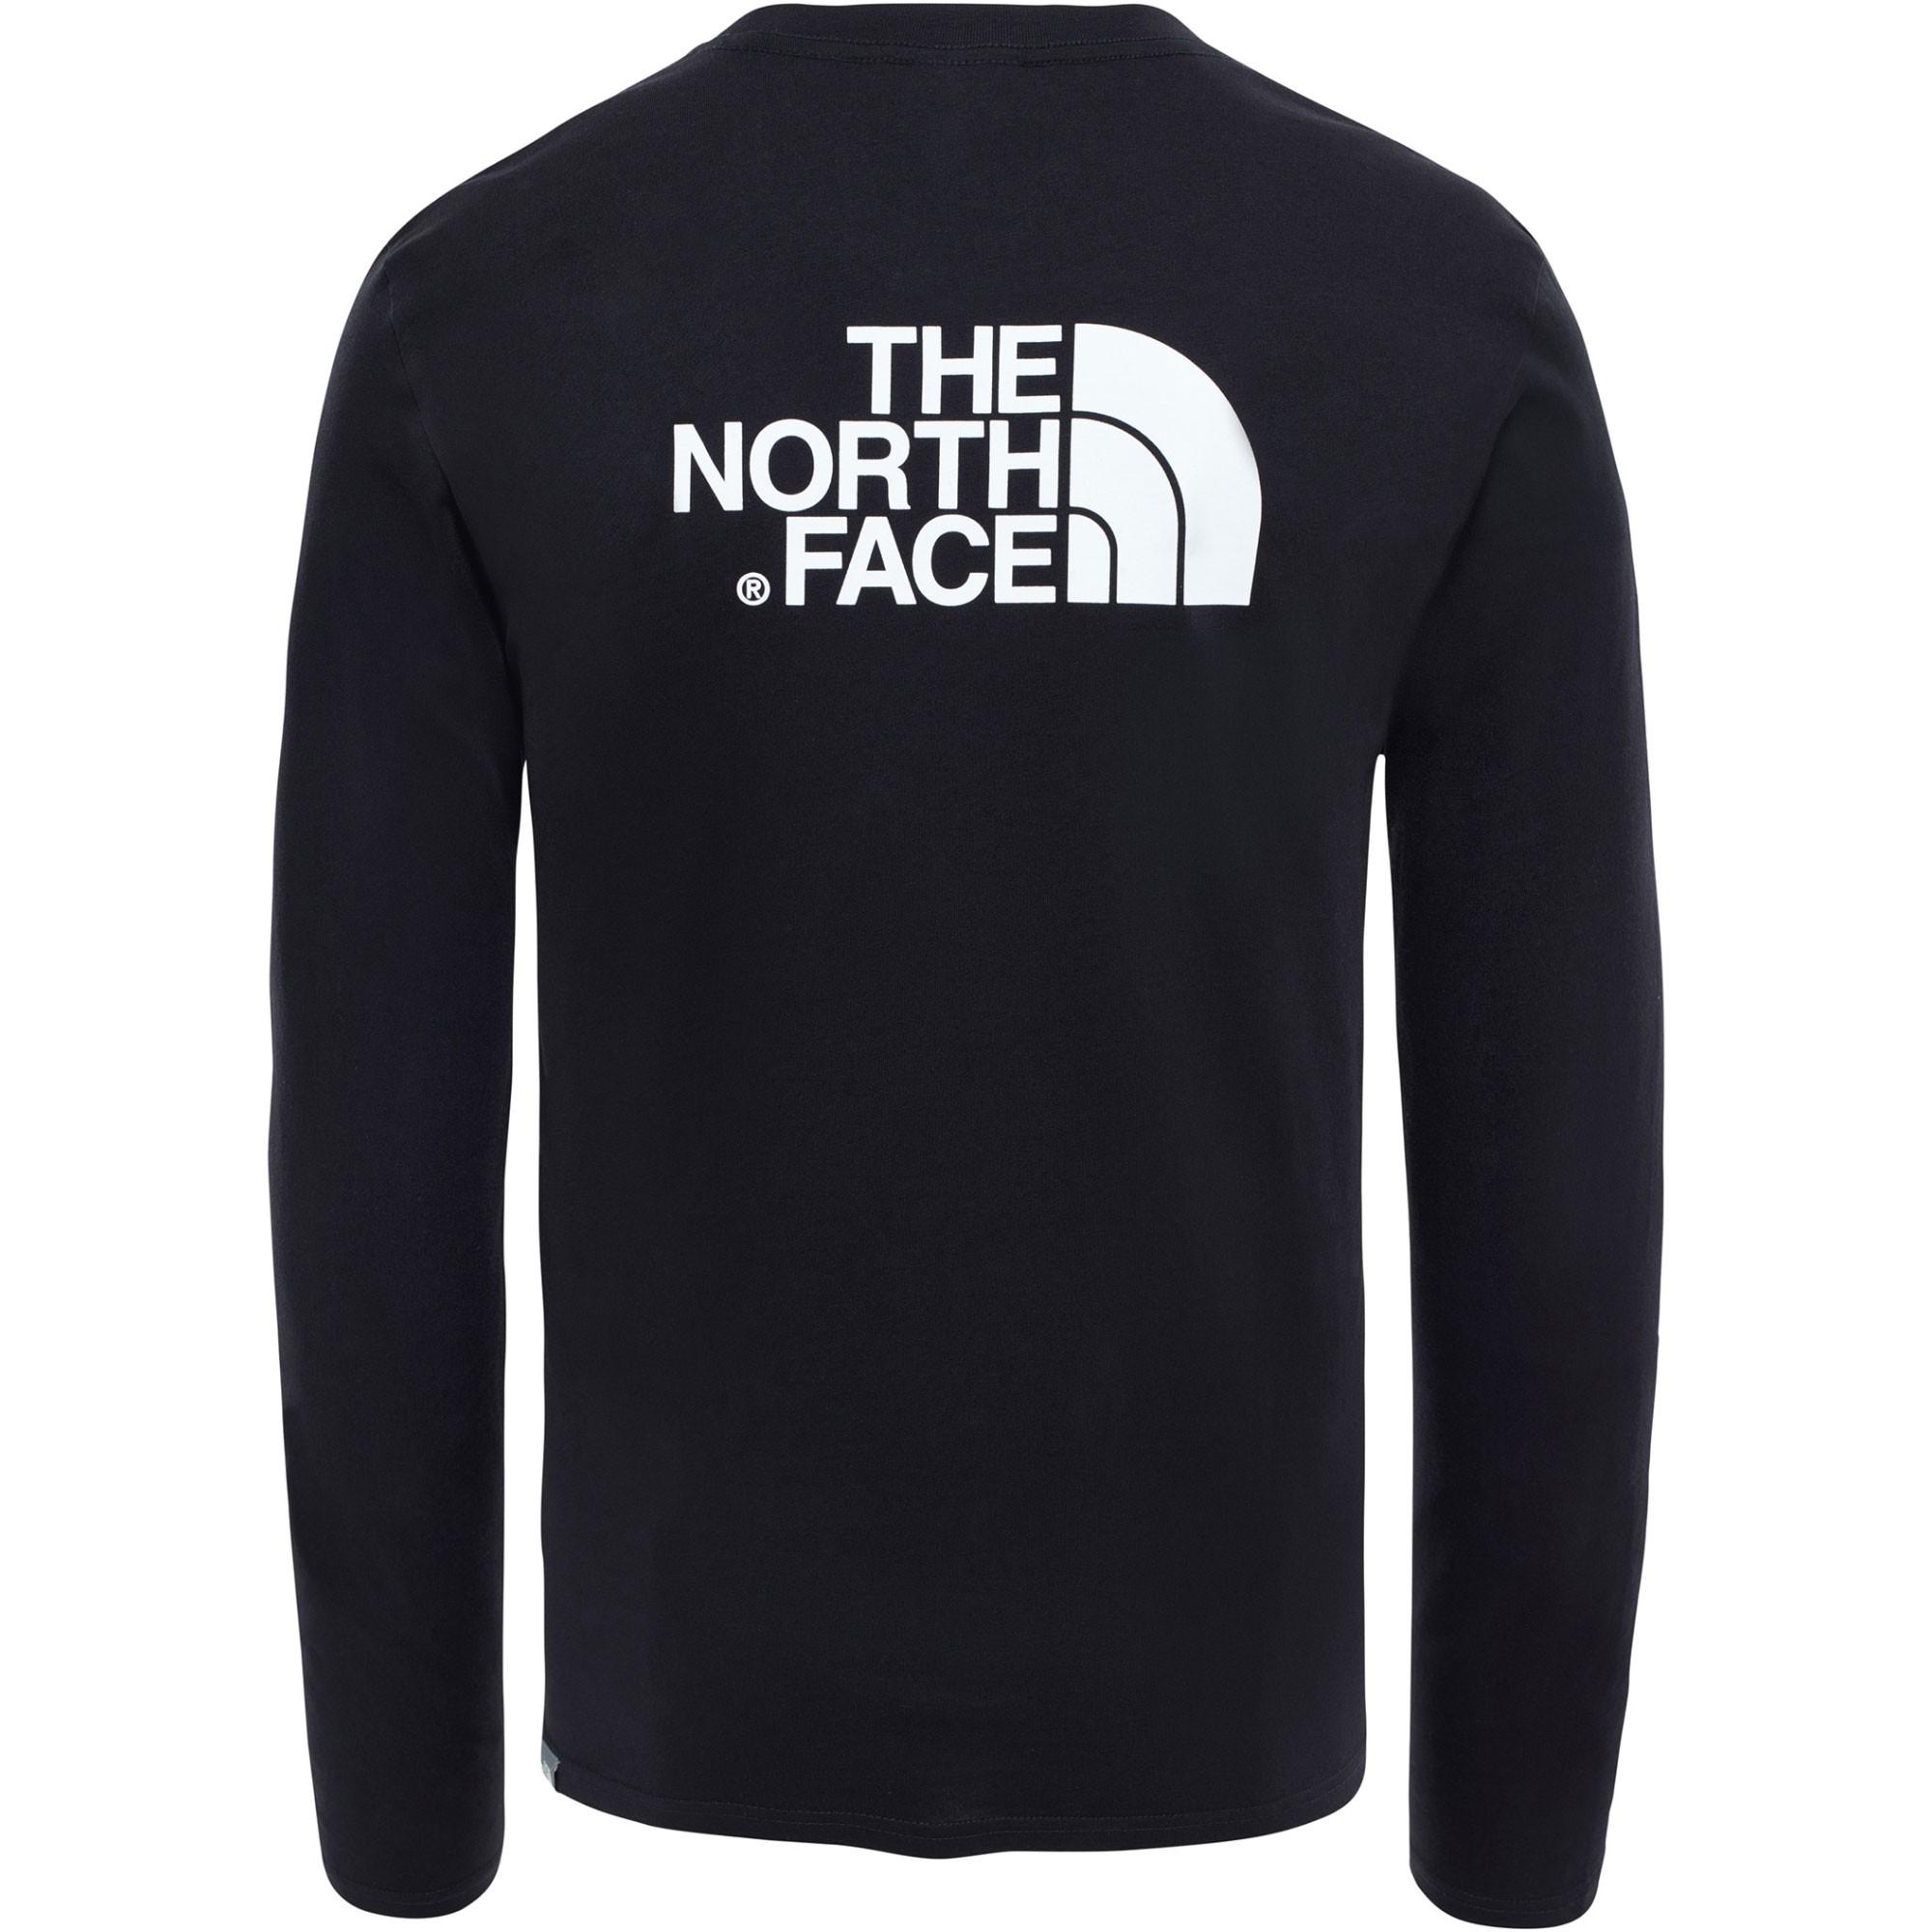 The North Face Long Sleeve Easy Tee - TNF Black